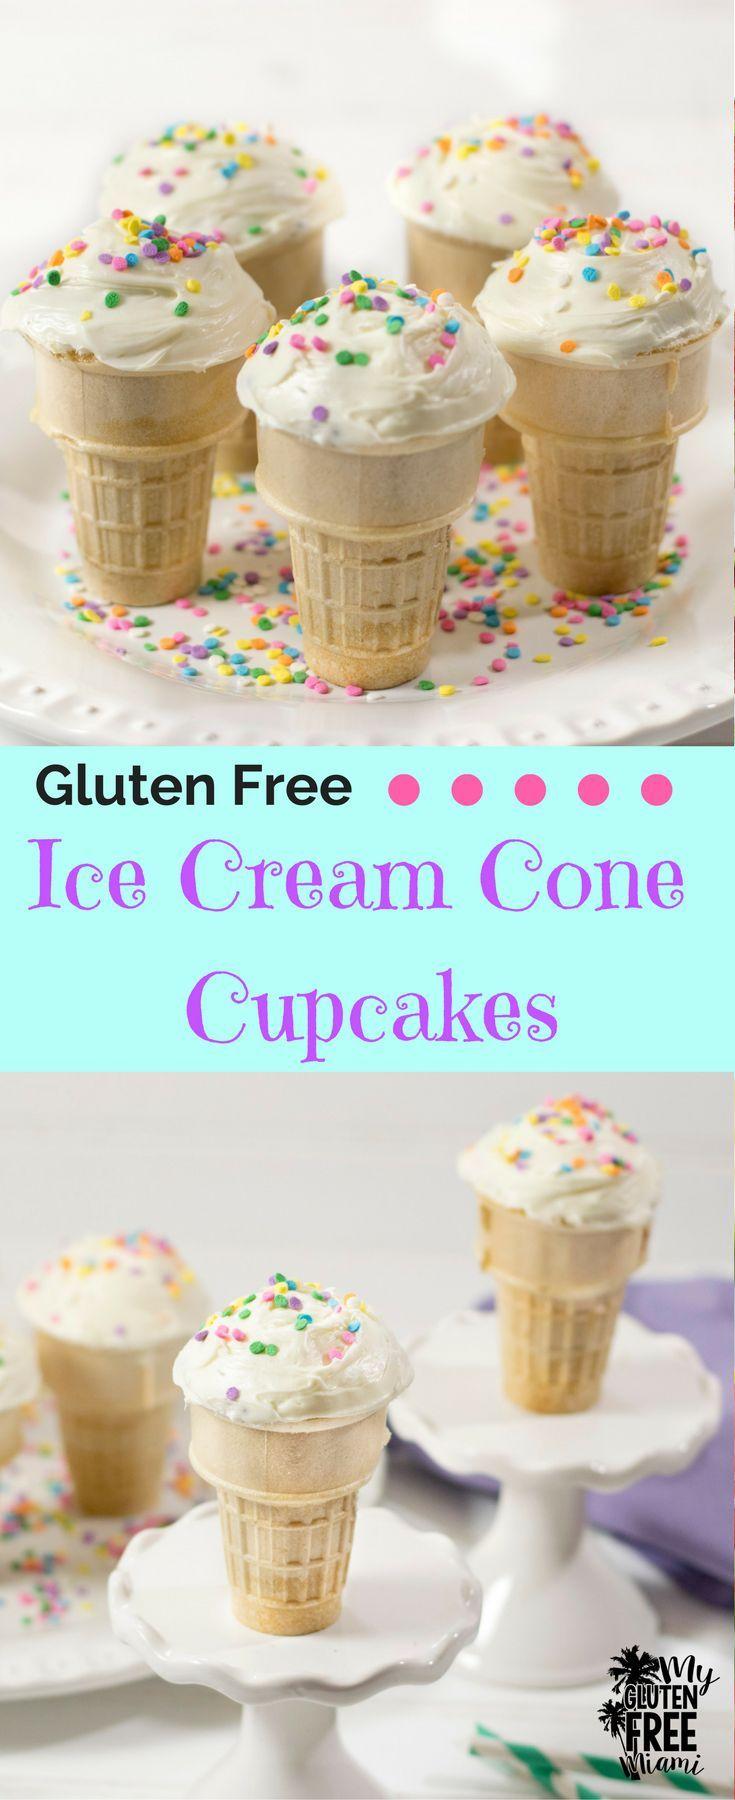 Gluten free ice cream cone cupcakes recipe gluten free